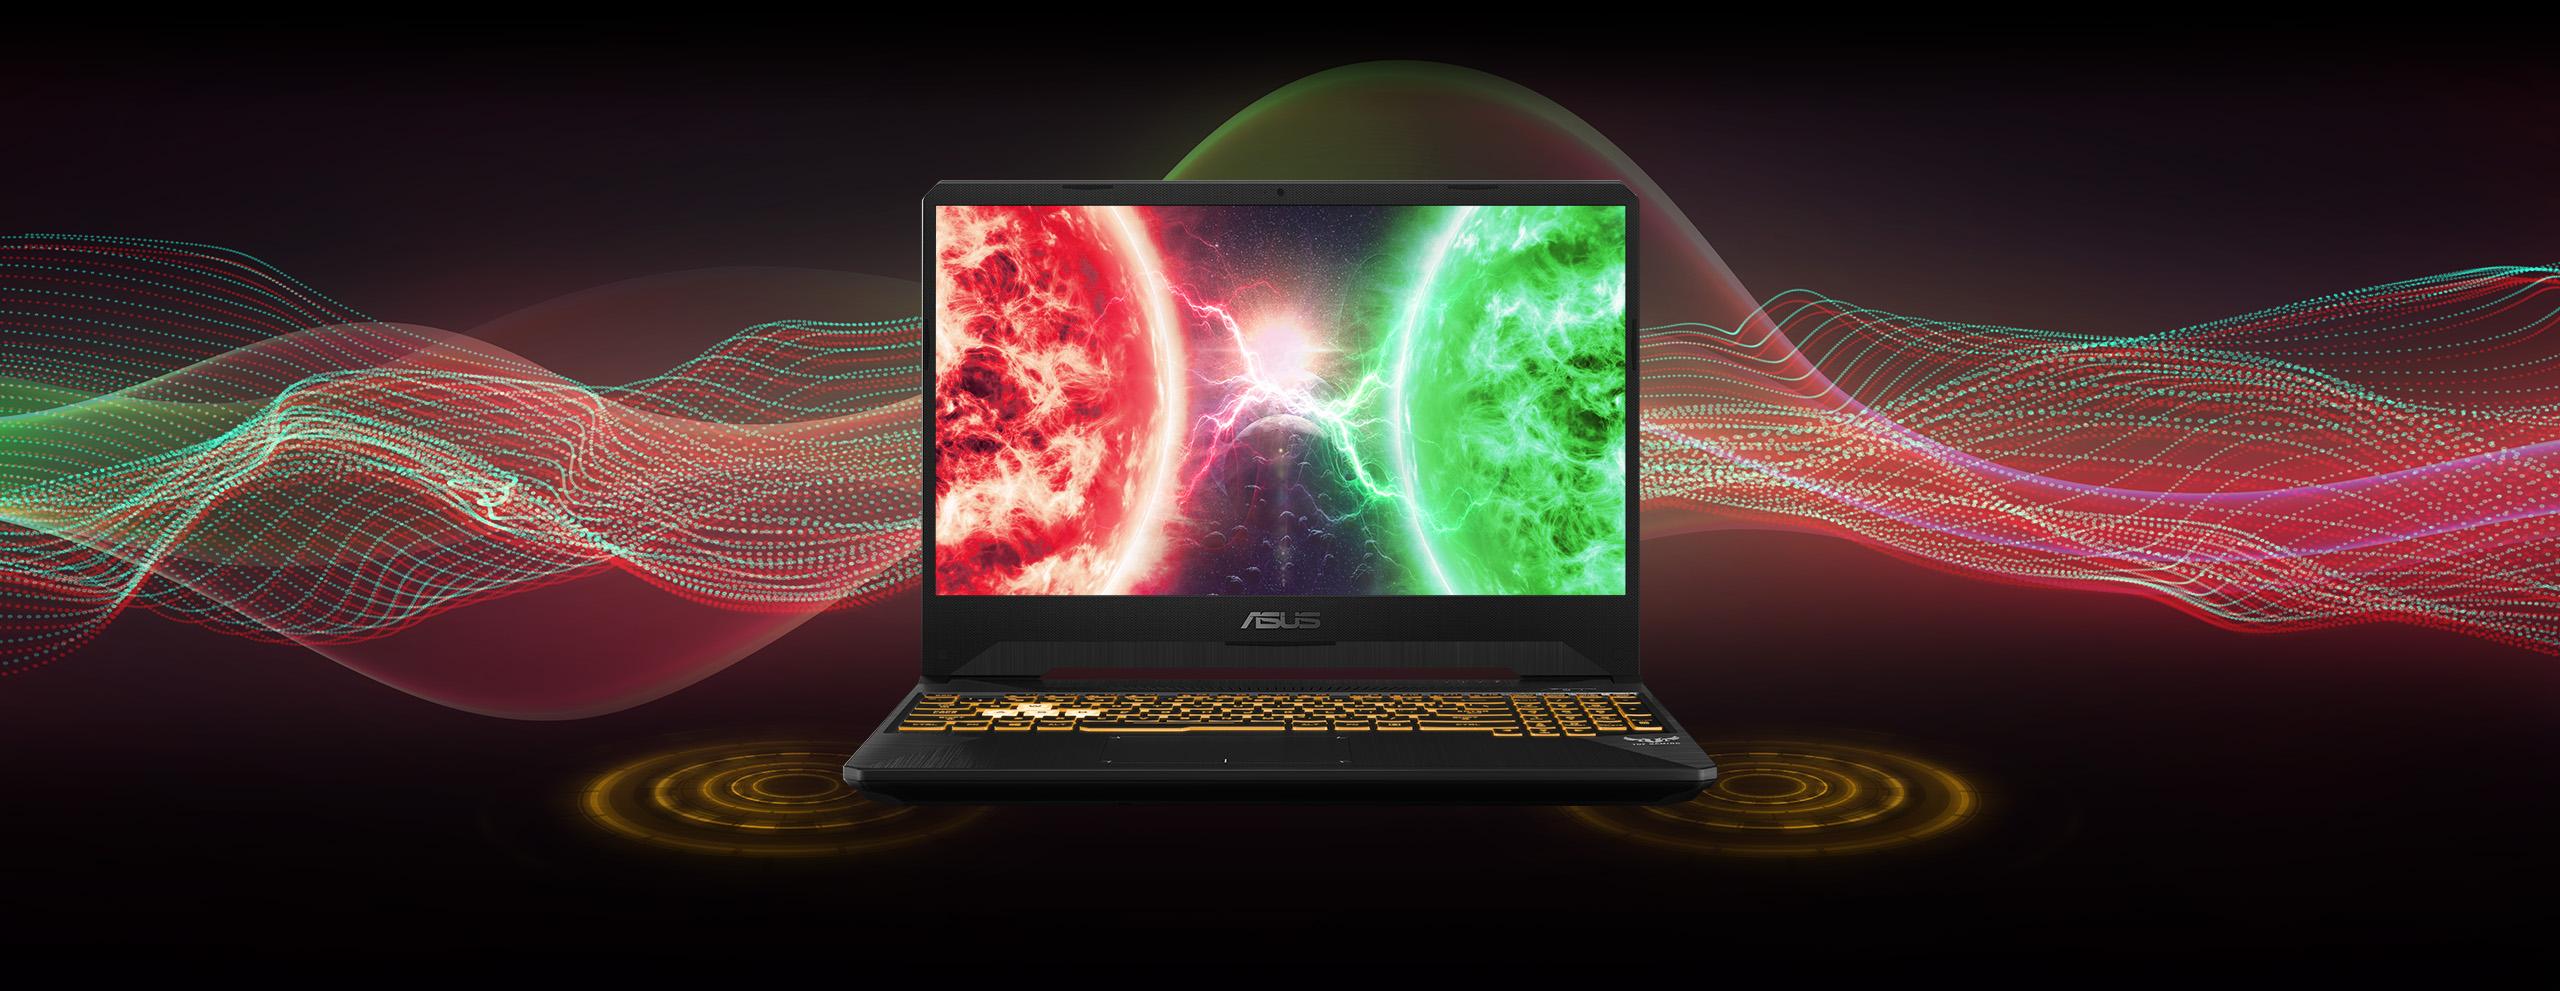 https://dlcdnimgs.asus.com/websites/global/products/4cDARfbRGBOGLKa1/img/desktop/09_4.jpg